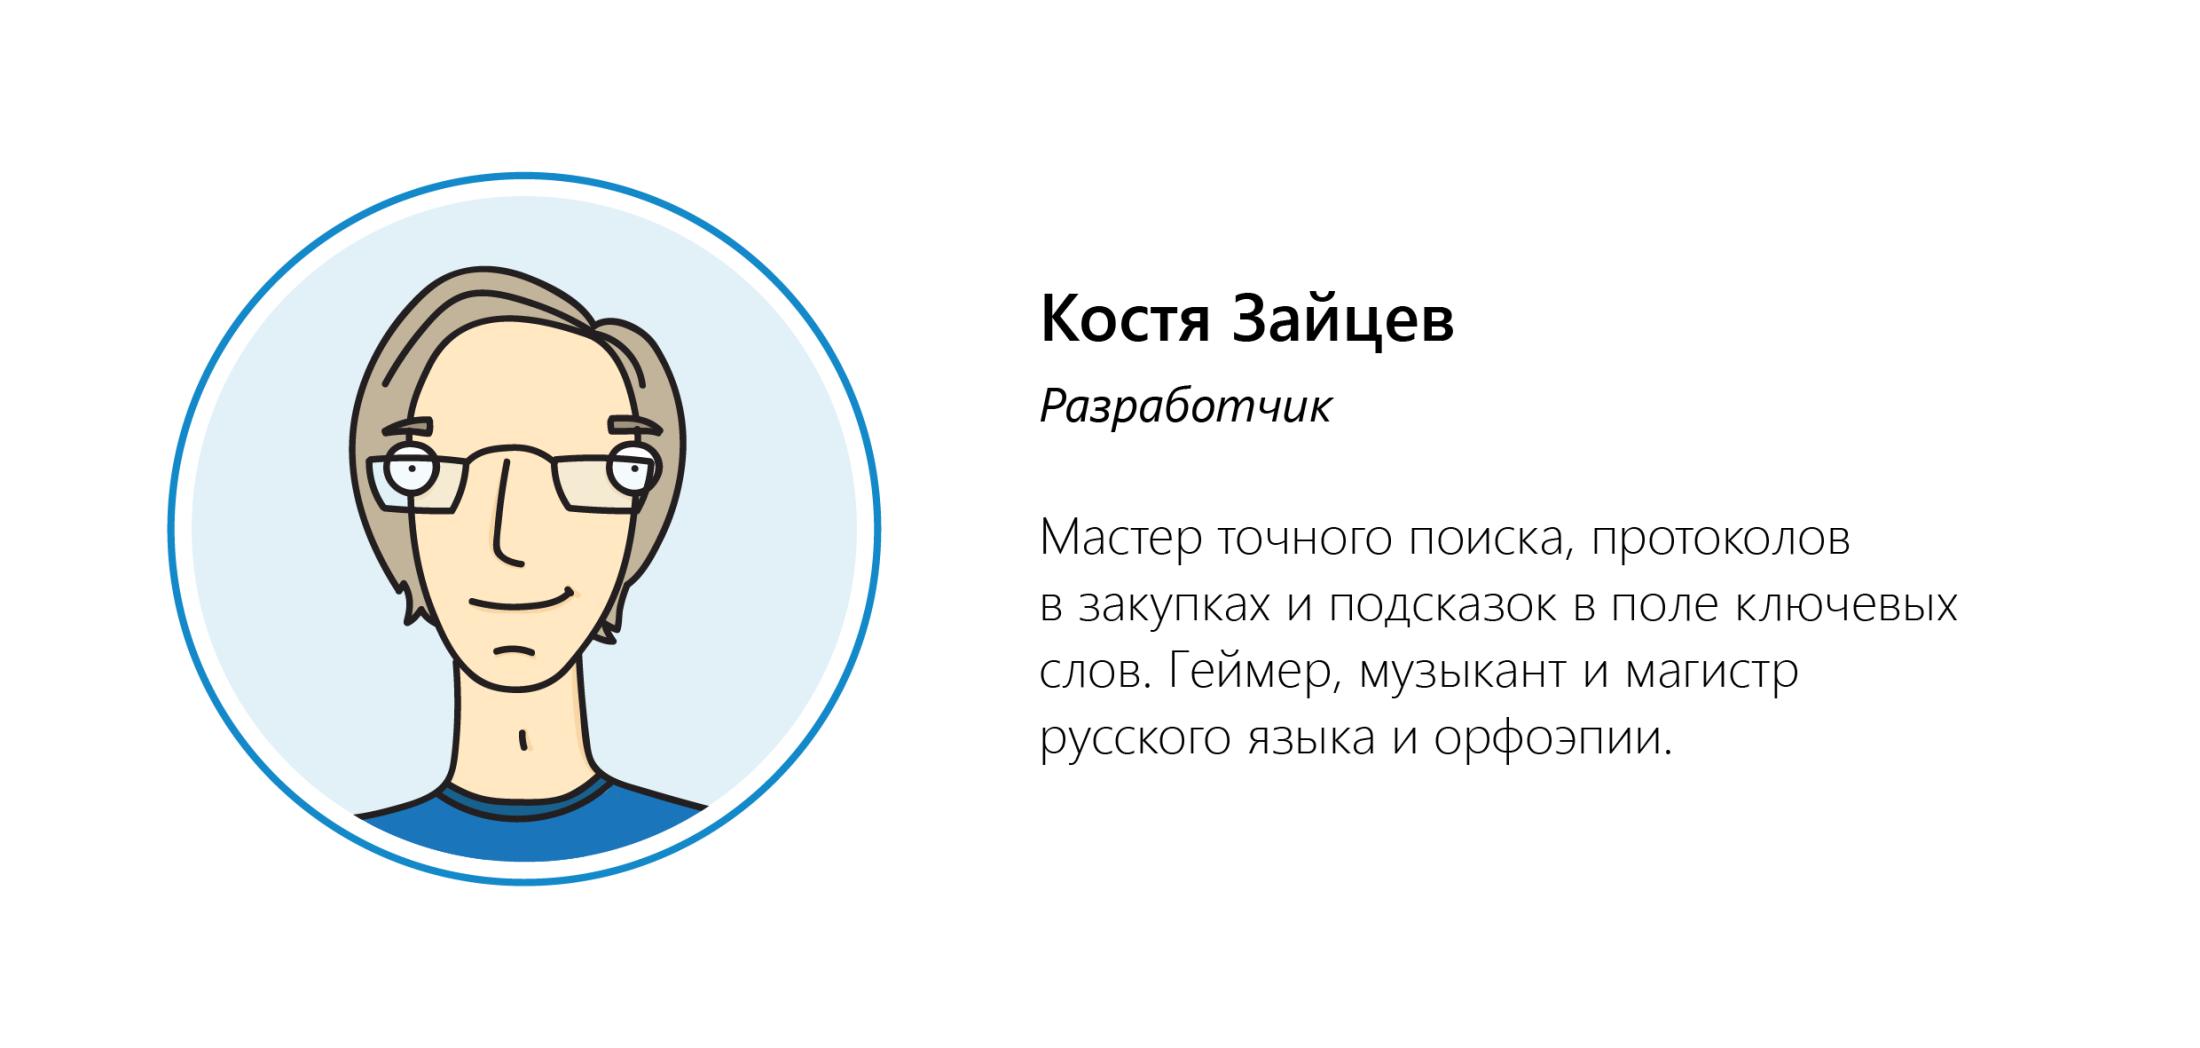 Костя Зайцев